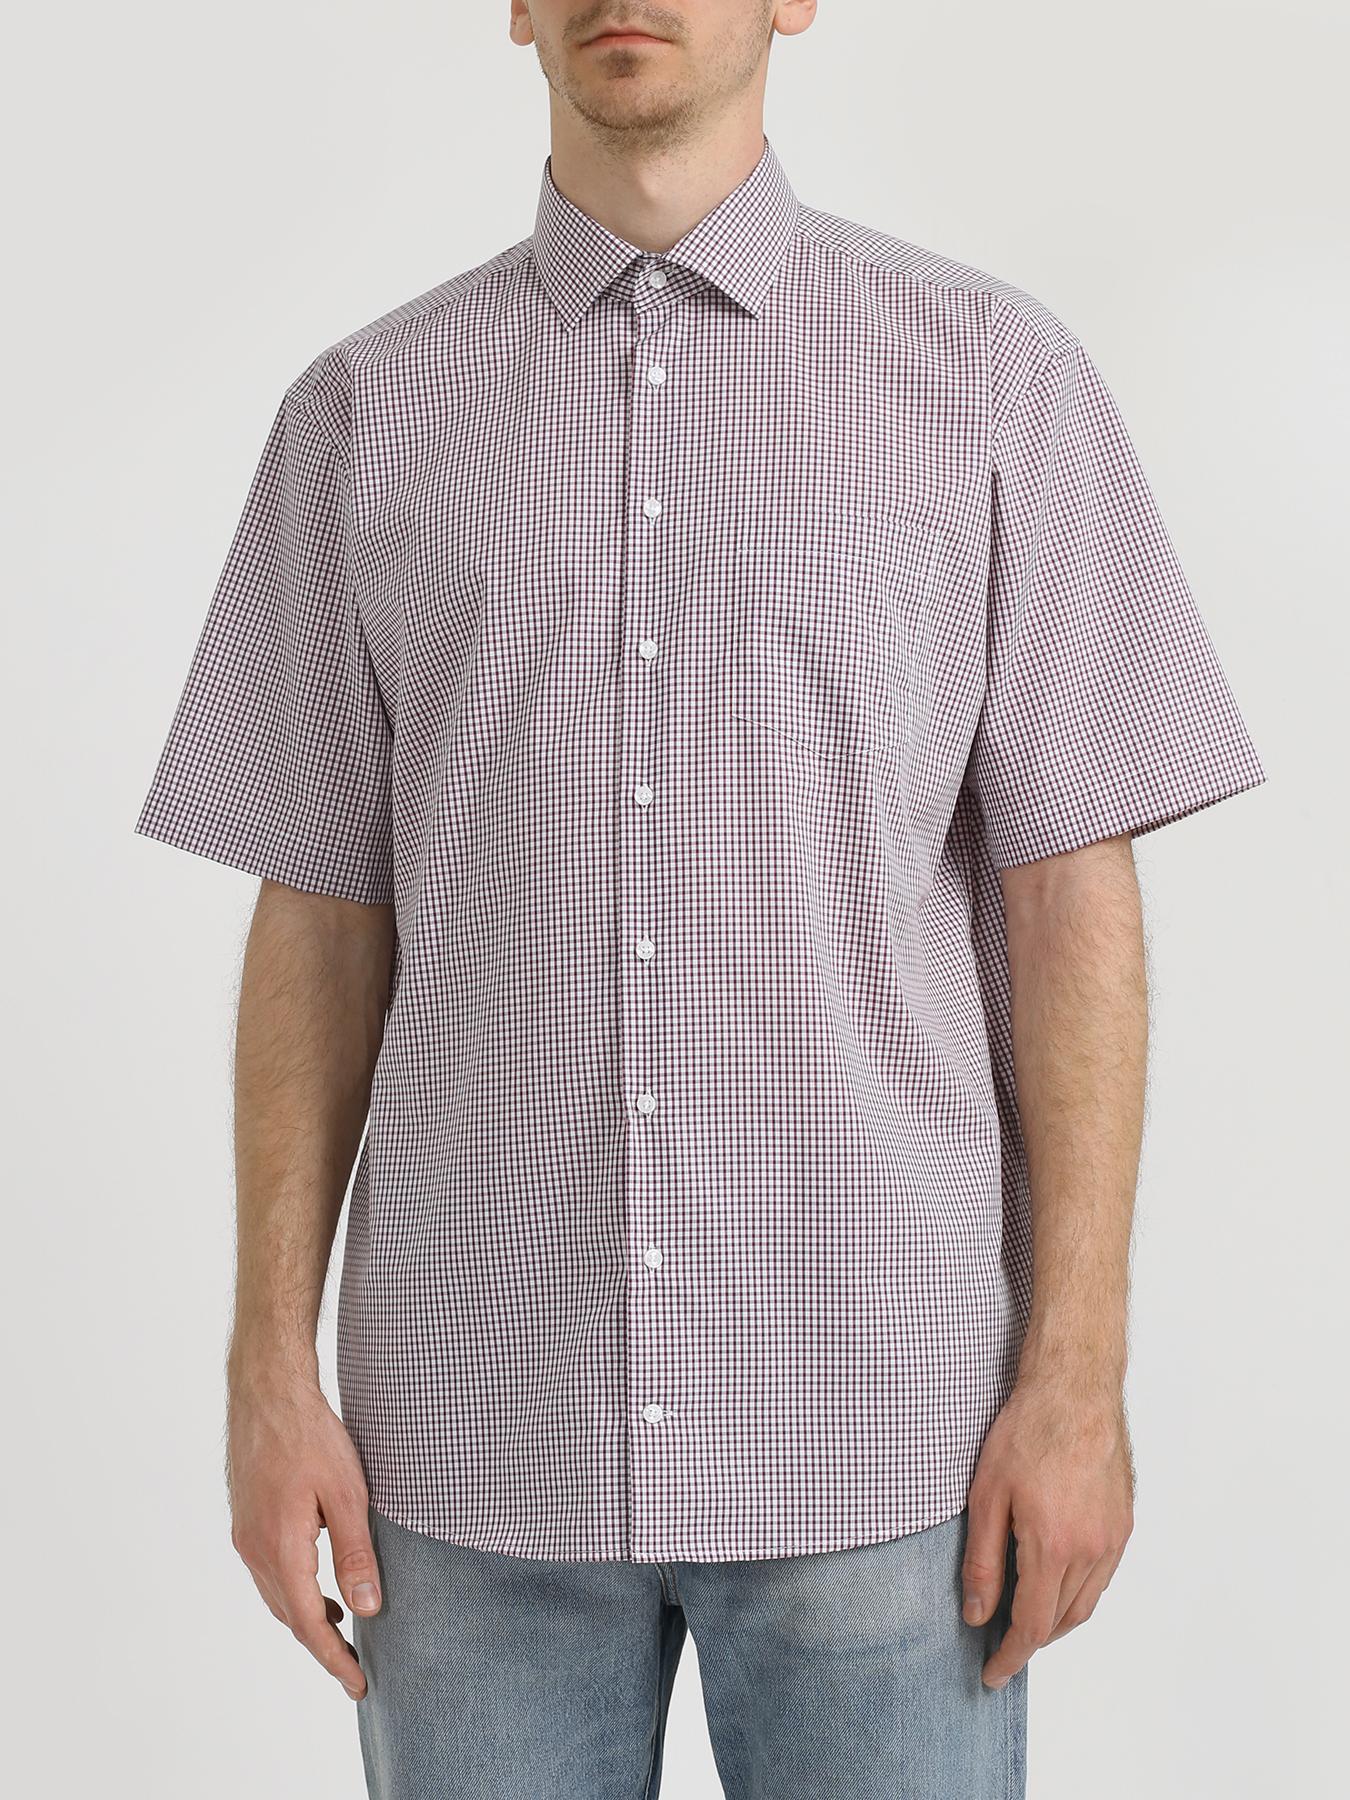 Рубашки Seidensticker Клетчатая рубашка фото